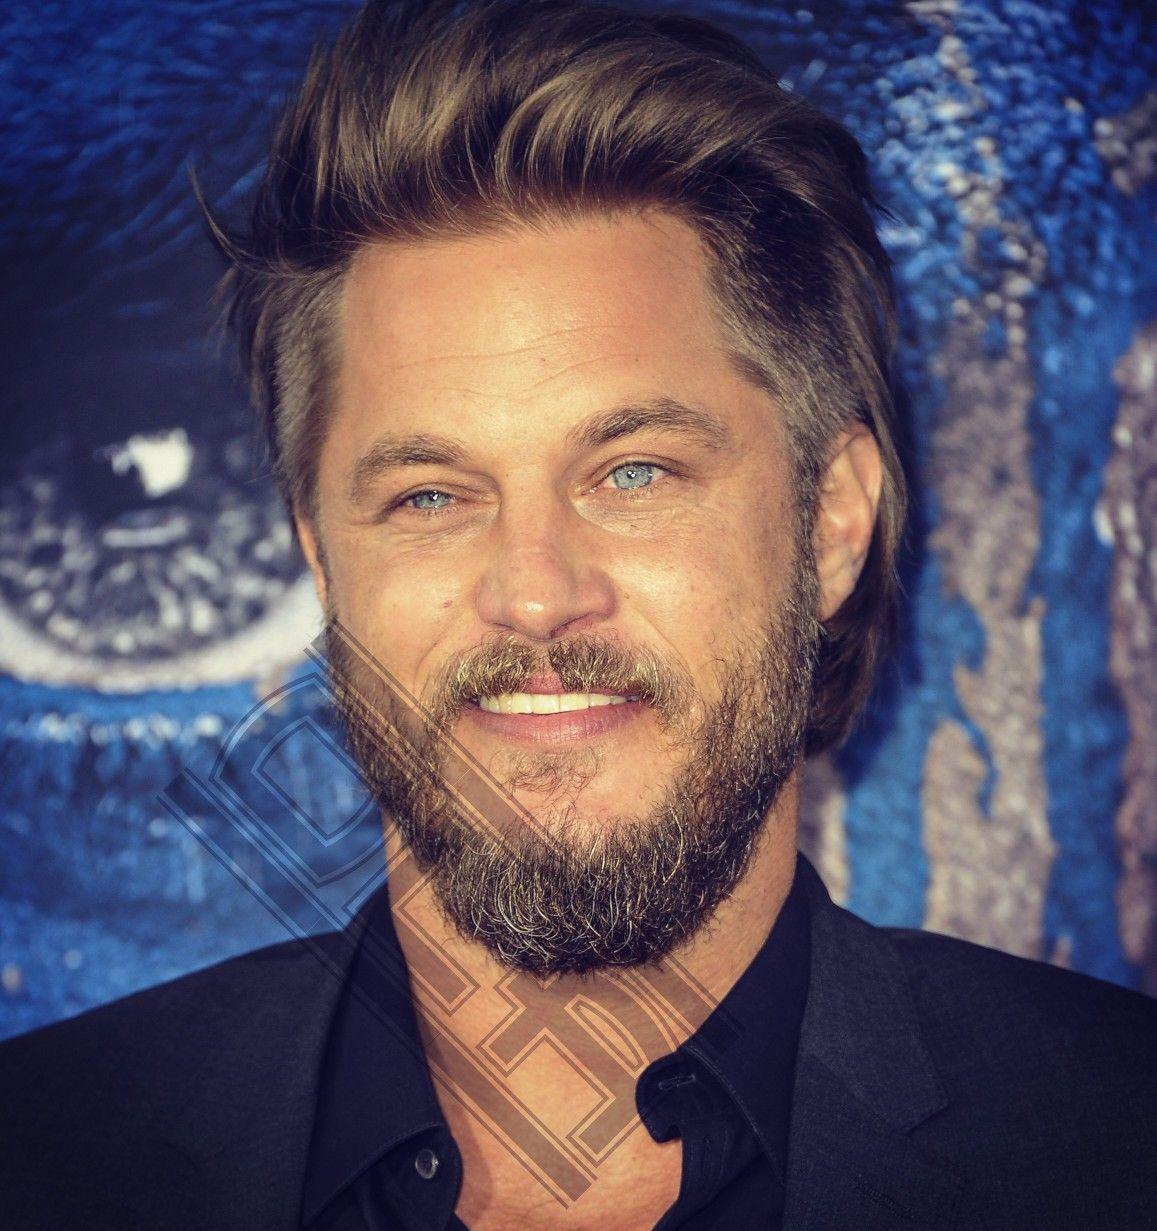 My Gorgeous Bearded Charming Aussie Man Travisfimmel Warcraft Vikings Fav Look Beard Hair Porneverything